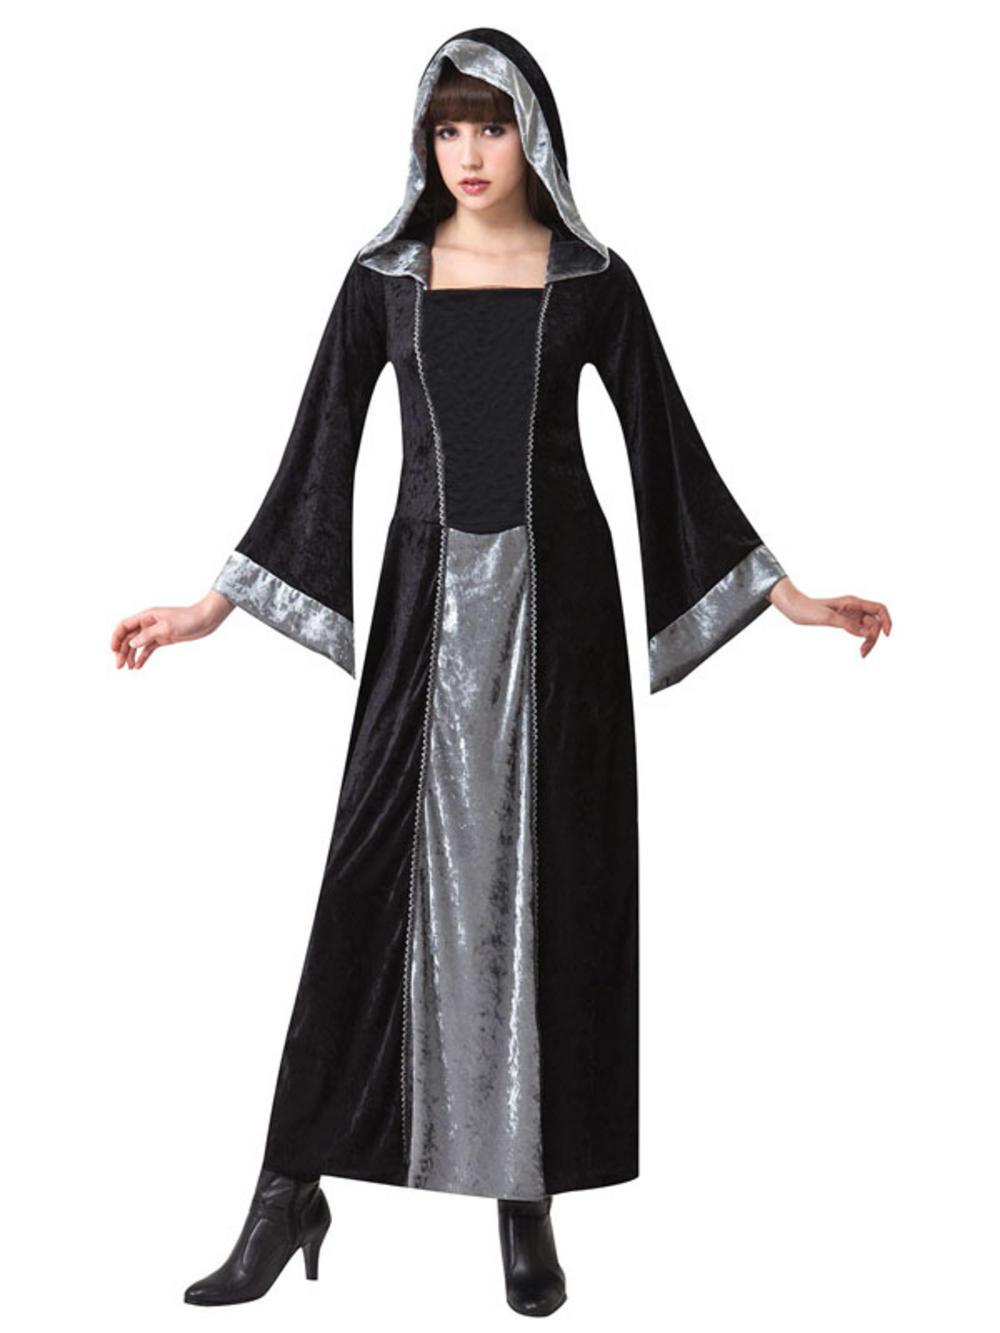 Black dress kisschasy lyrics - Ladies Black Cape Fancy Dress